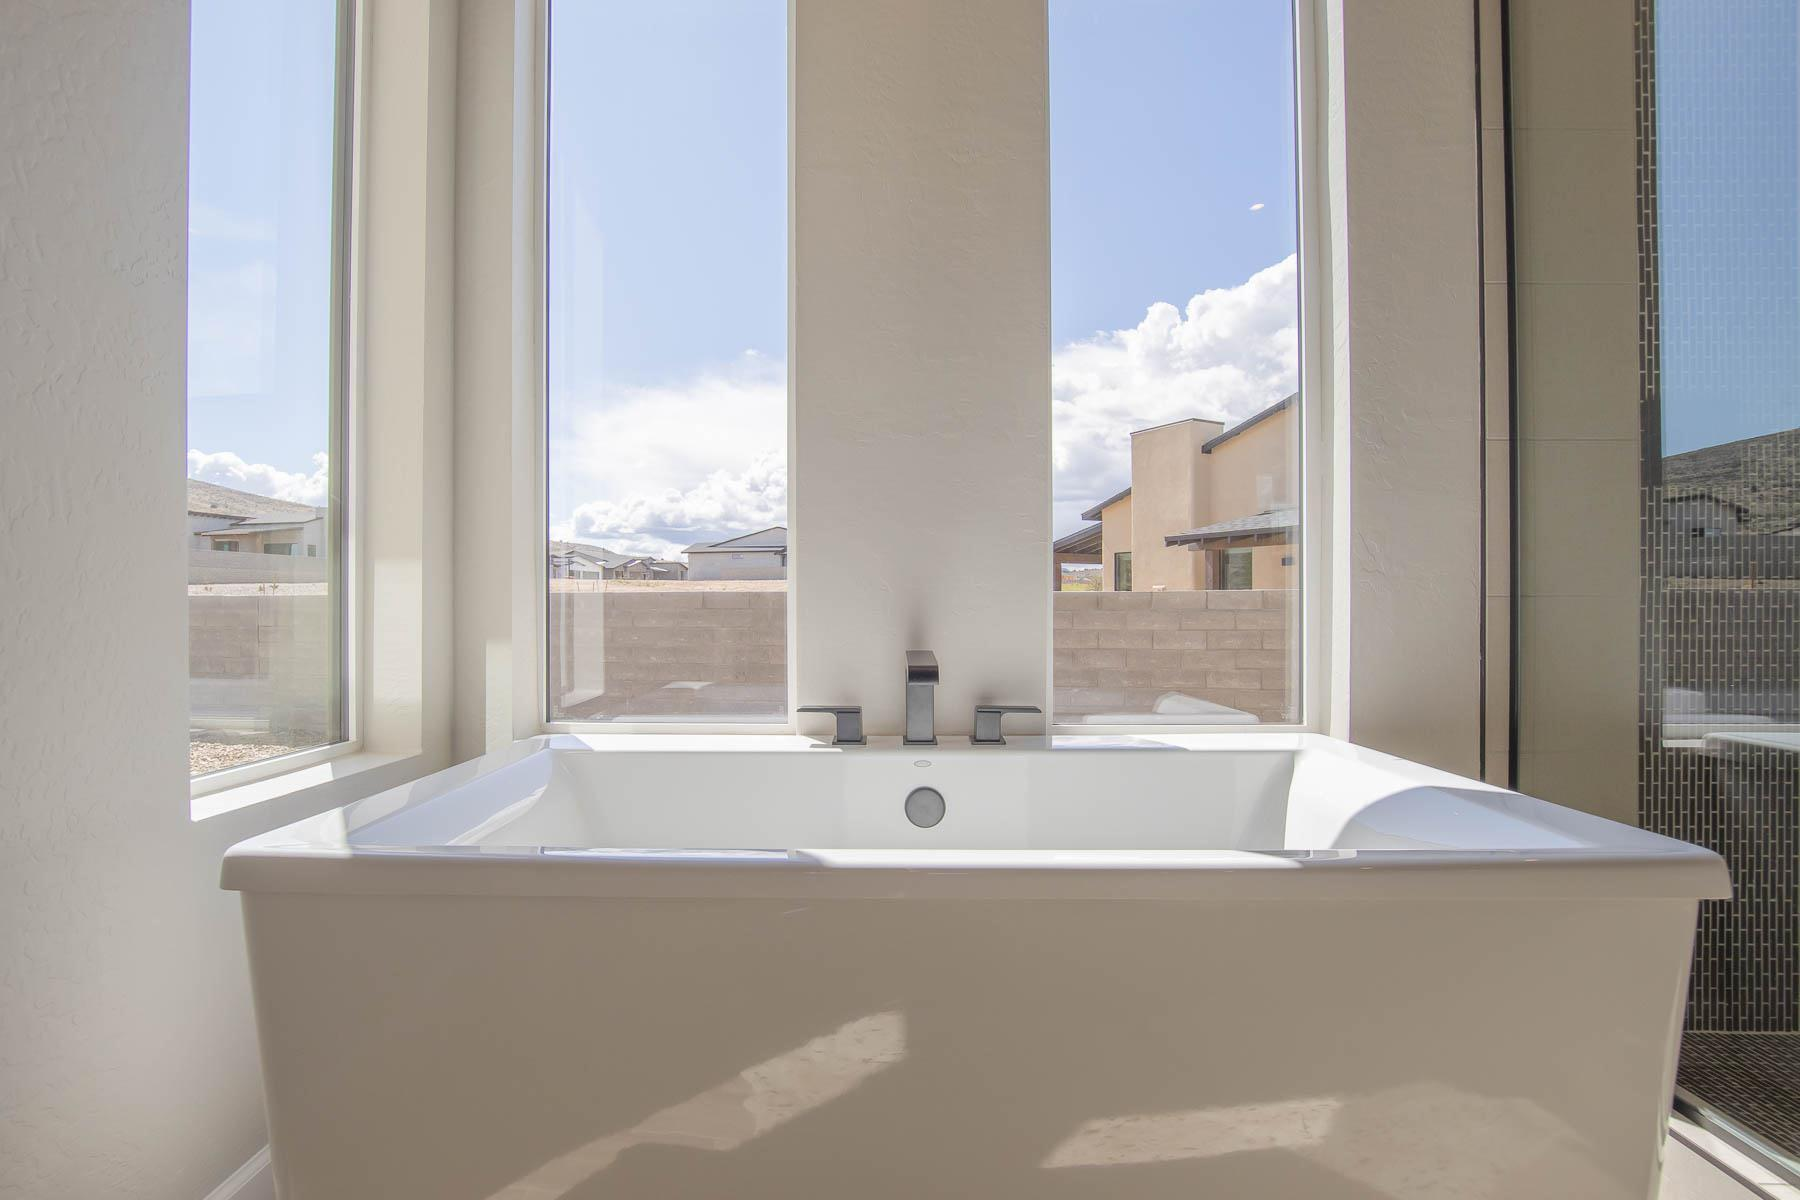 Bathroom featured in the J706 By Mandalay Homes in Prescott, AZ